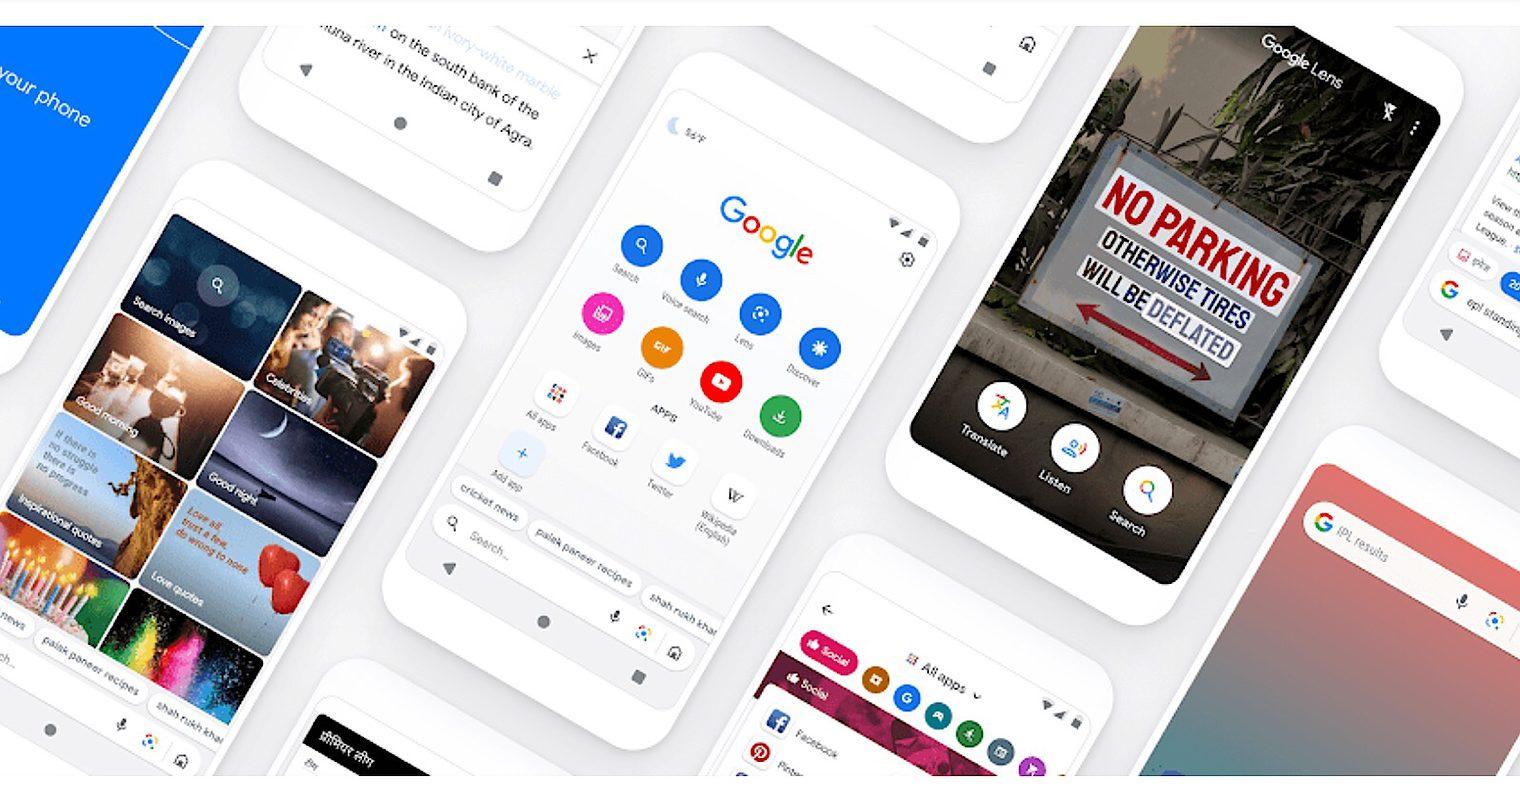 Google's Lightweight Search App 'Google Go' Available Worldwide